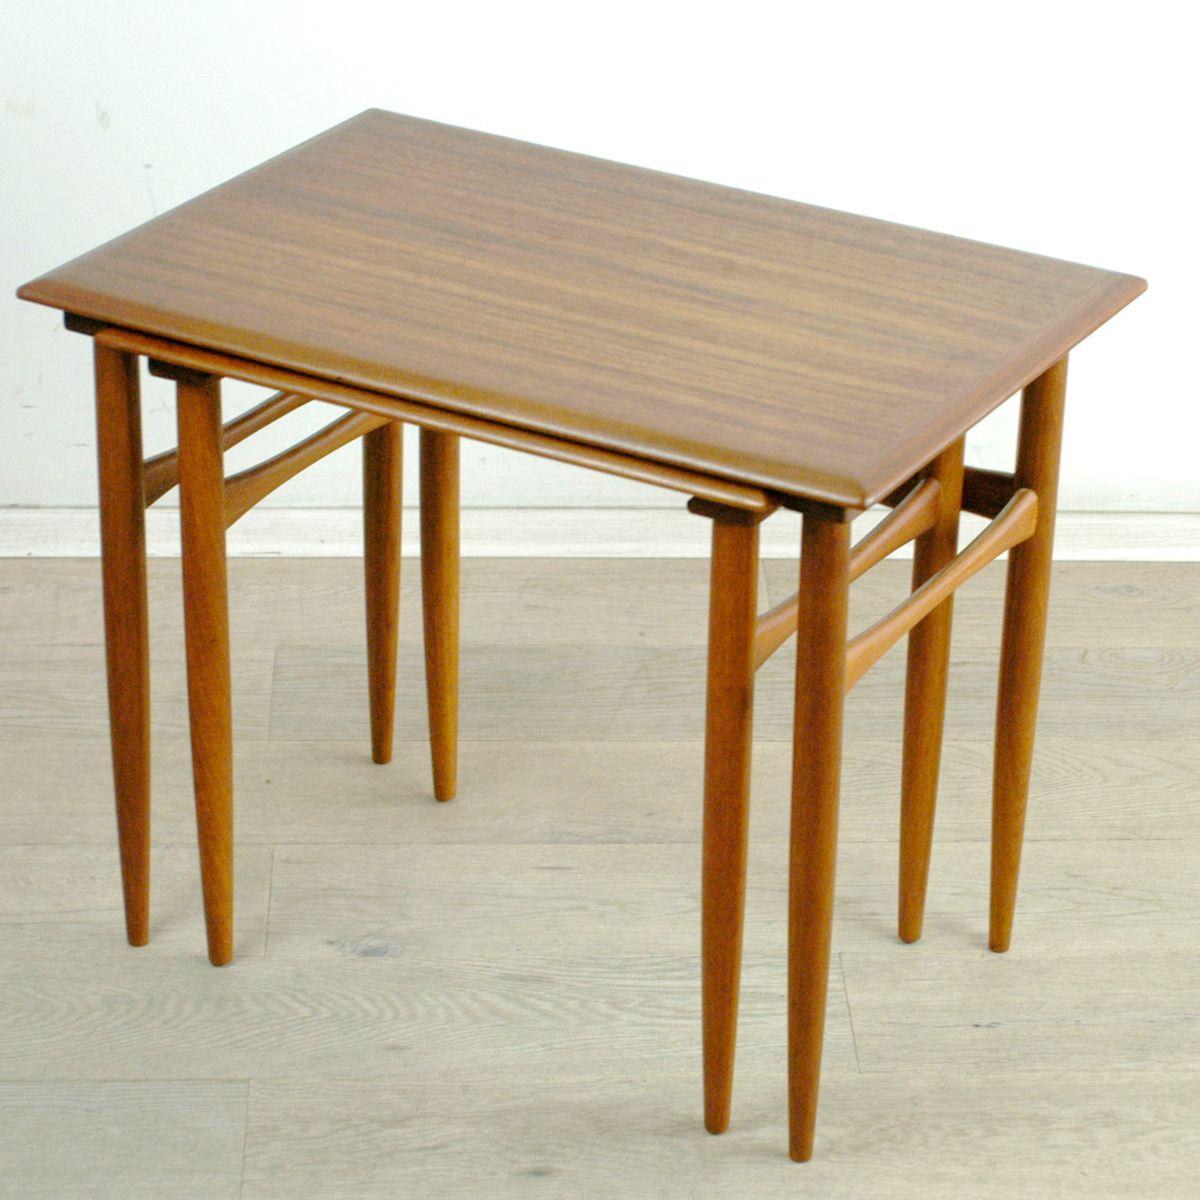 Danish Teak Nesting Tables By Poul Hundevad For Fabian, 1960s, Set Of 2